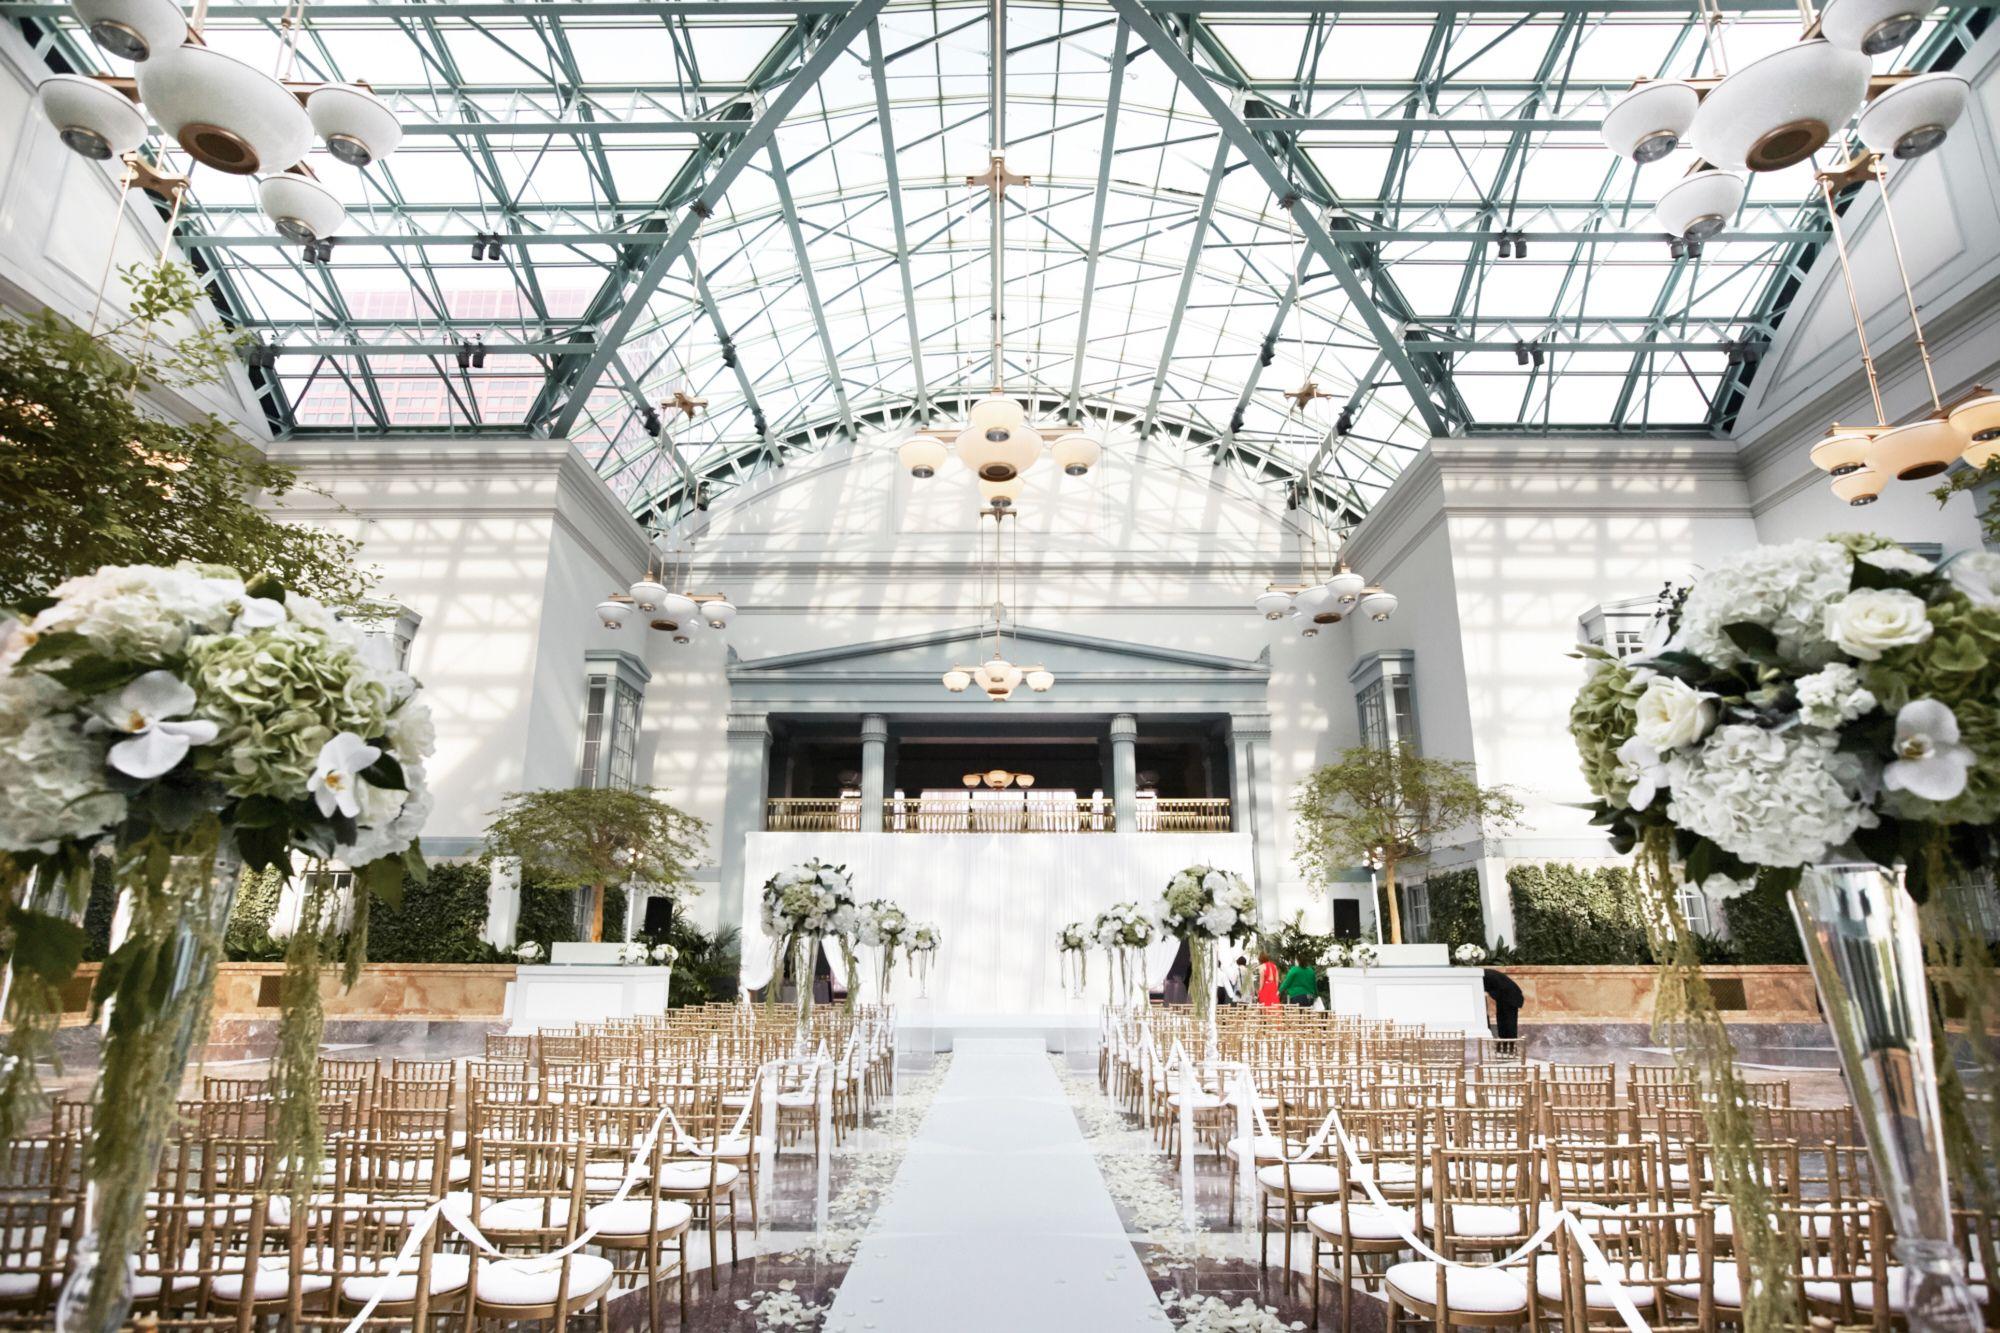 Cheap Wedding Photography Chicago: Harold Washington Library Wedding Ceremony